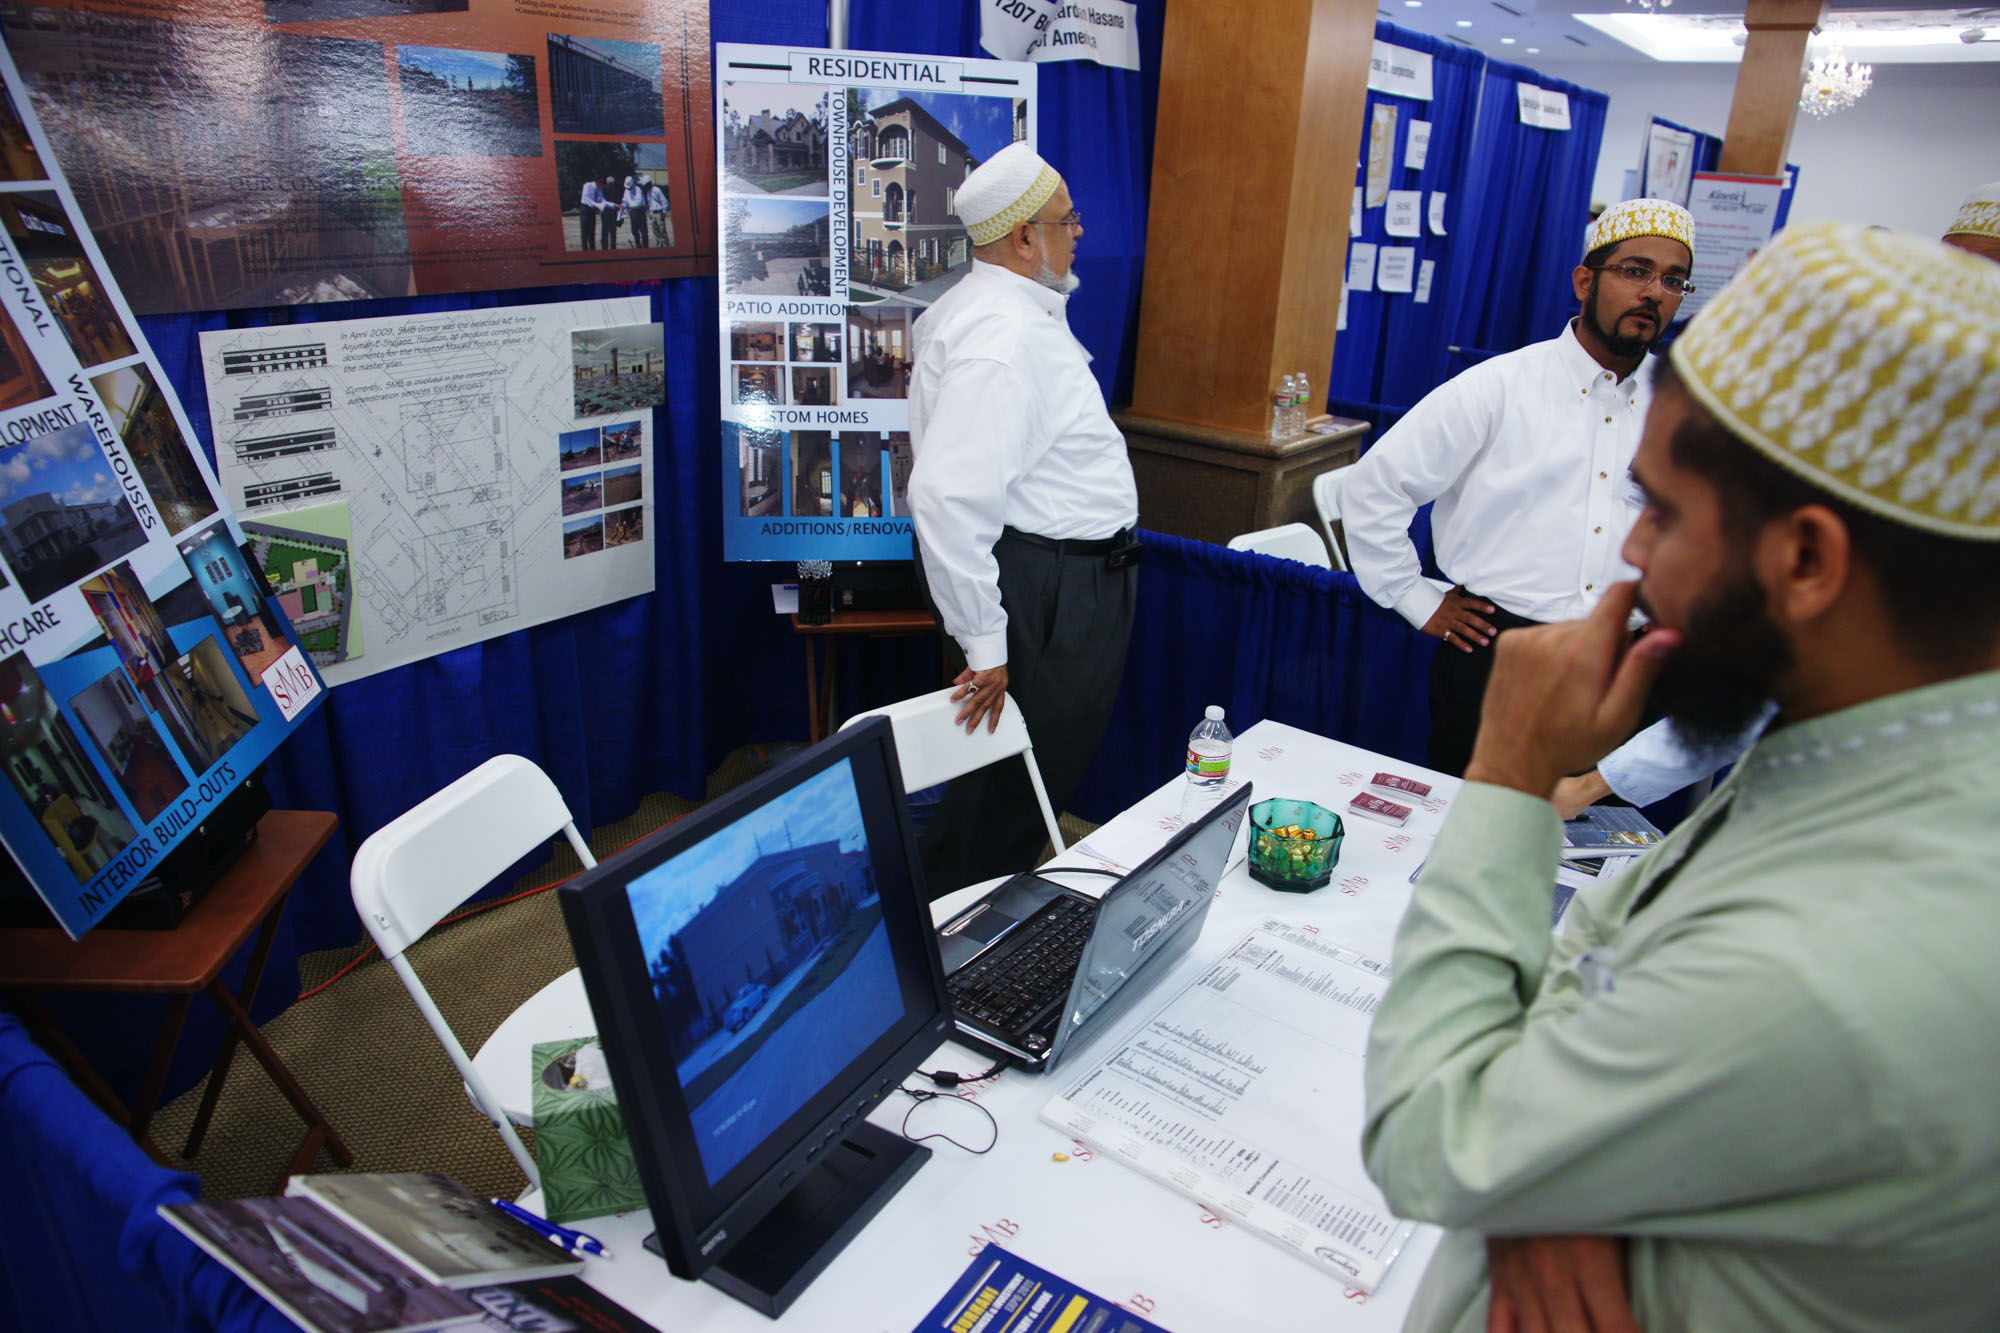 BBCC Houston Business Expo 2011 album-16975646-downloads-pt3-33.JPG